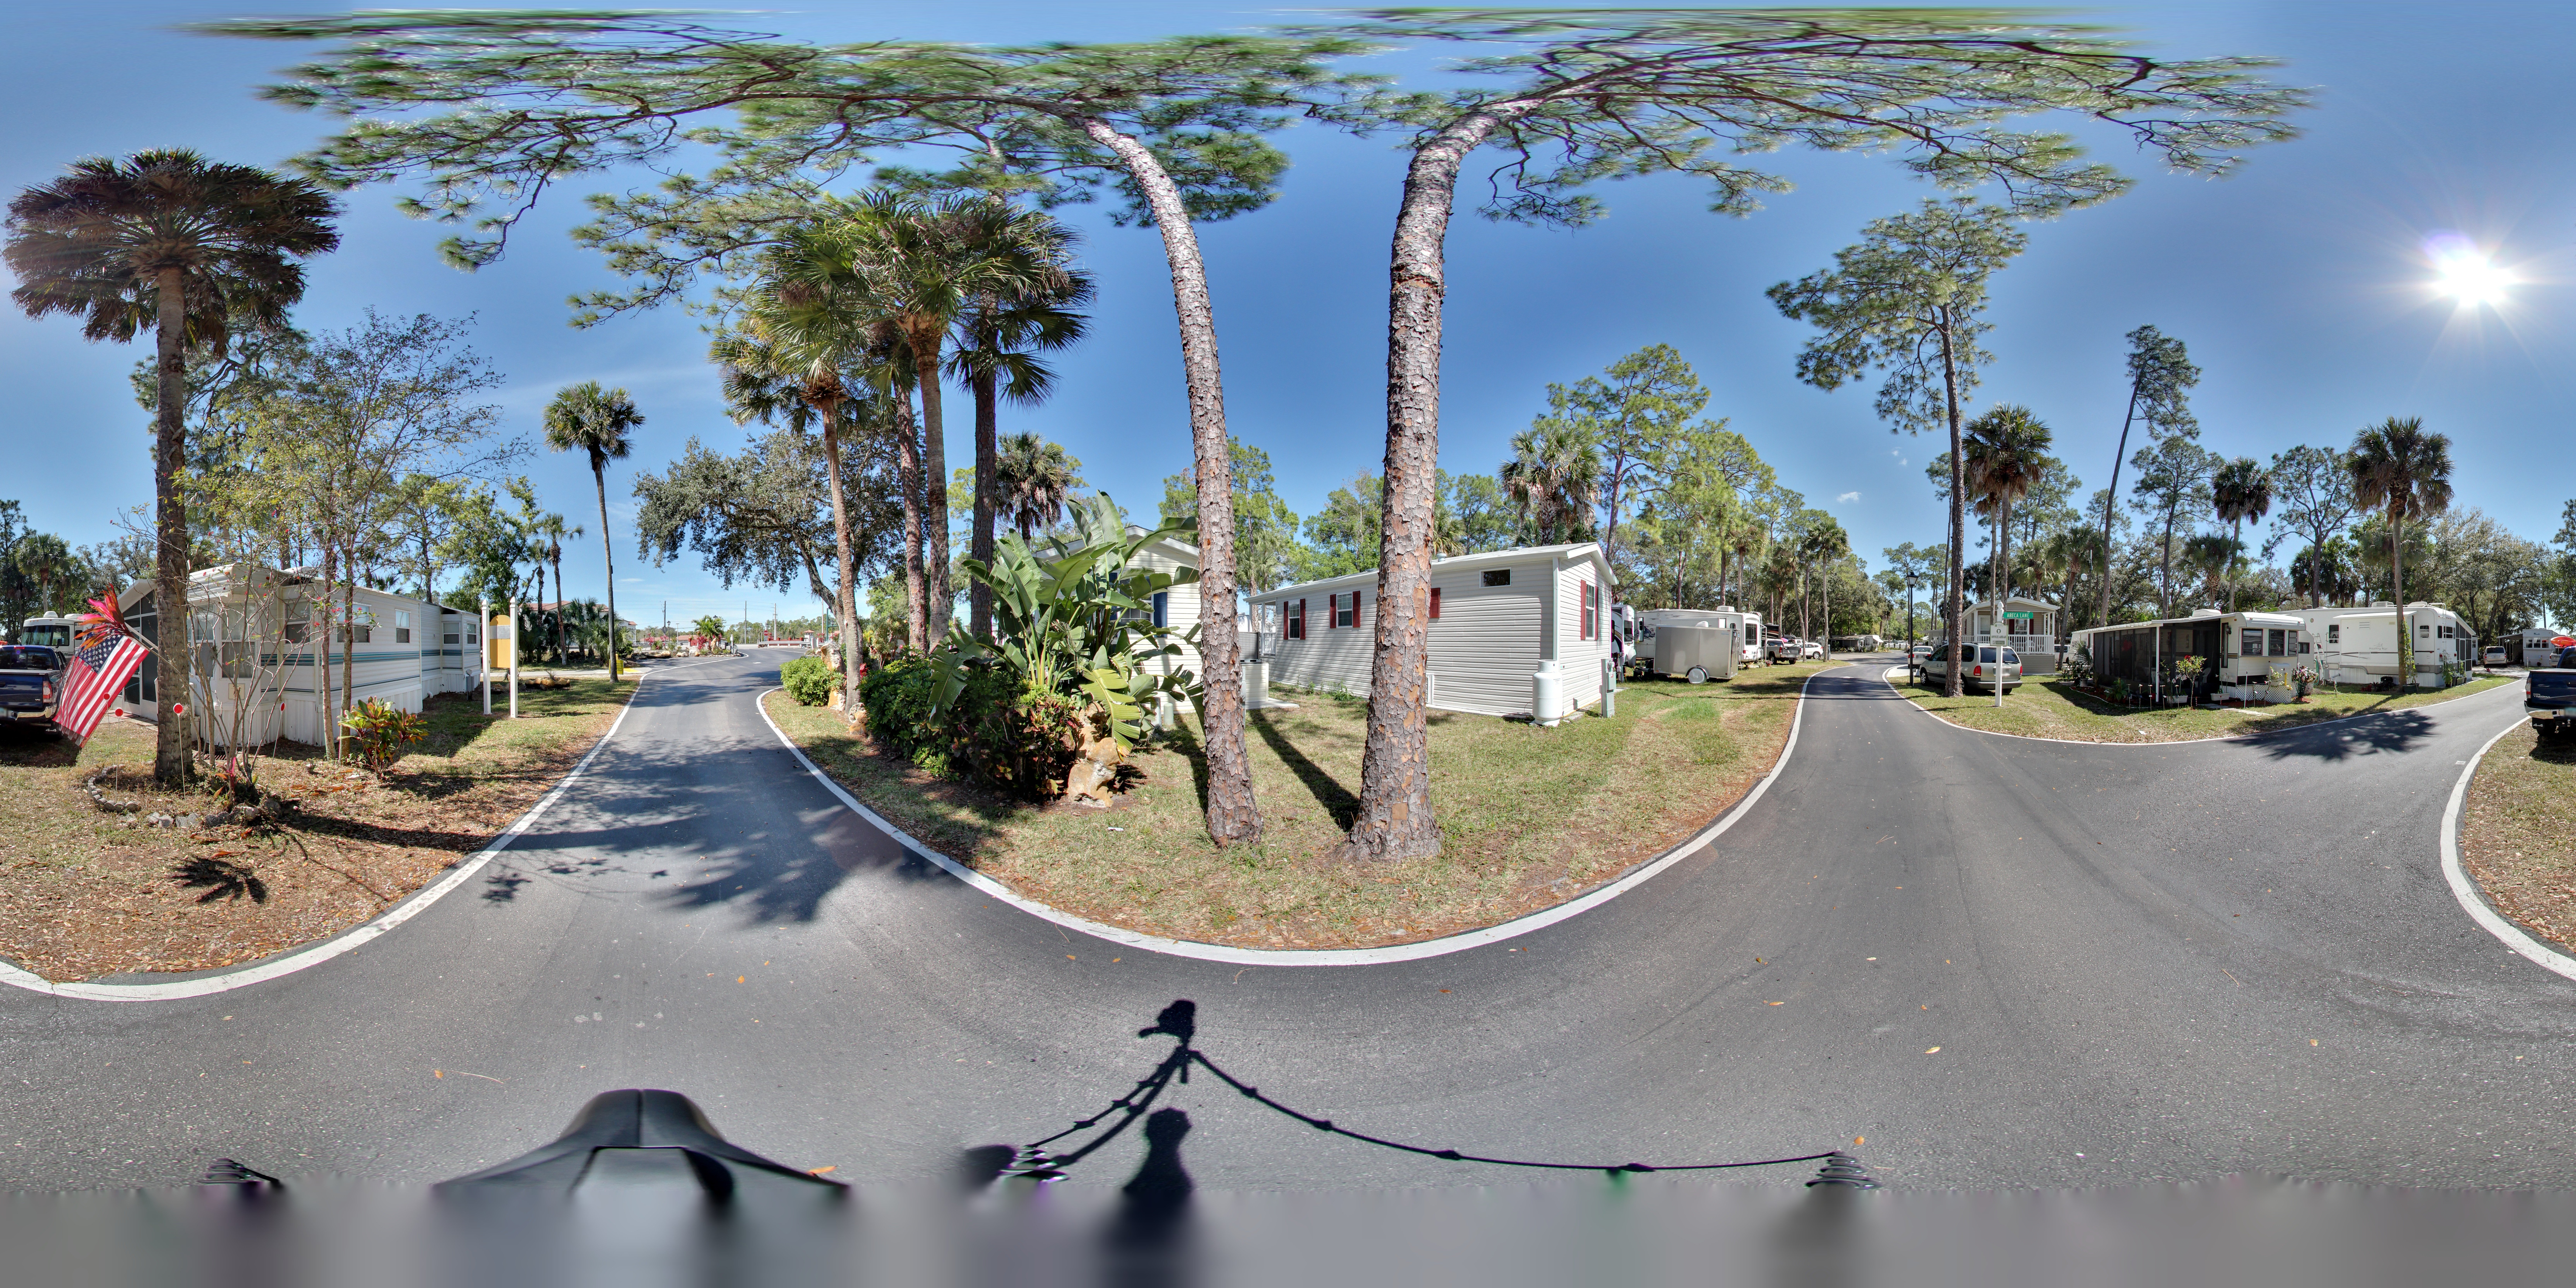 Naples RV Resort